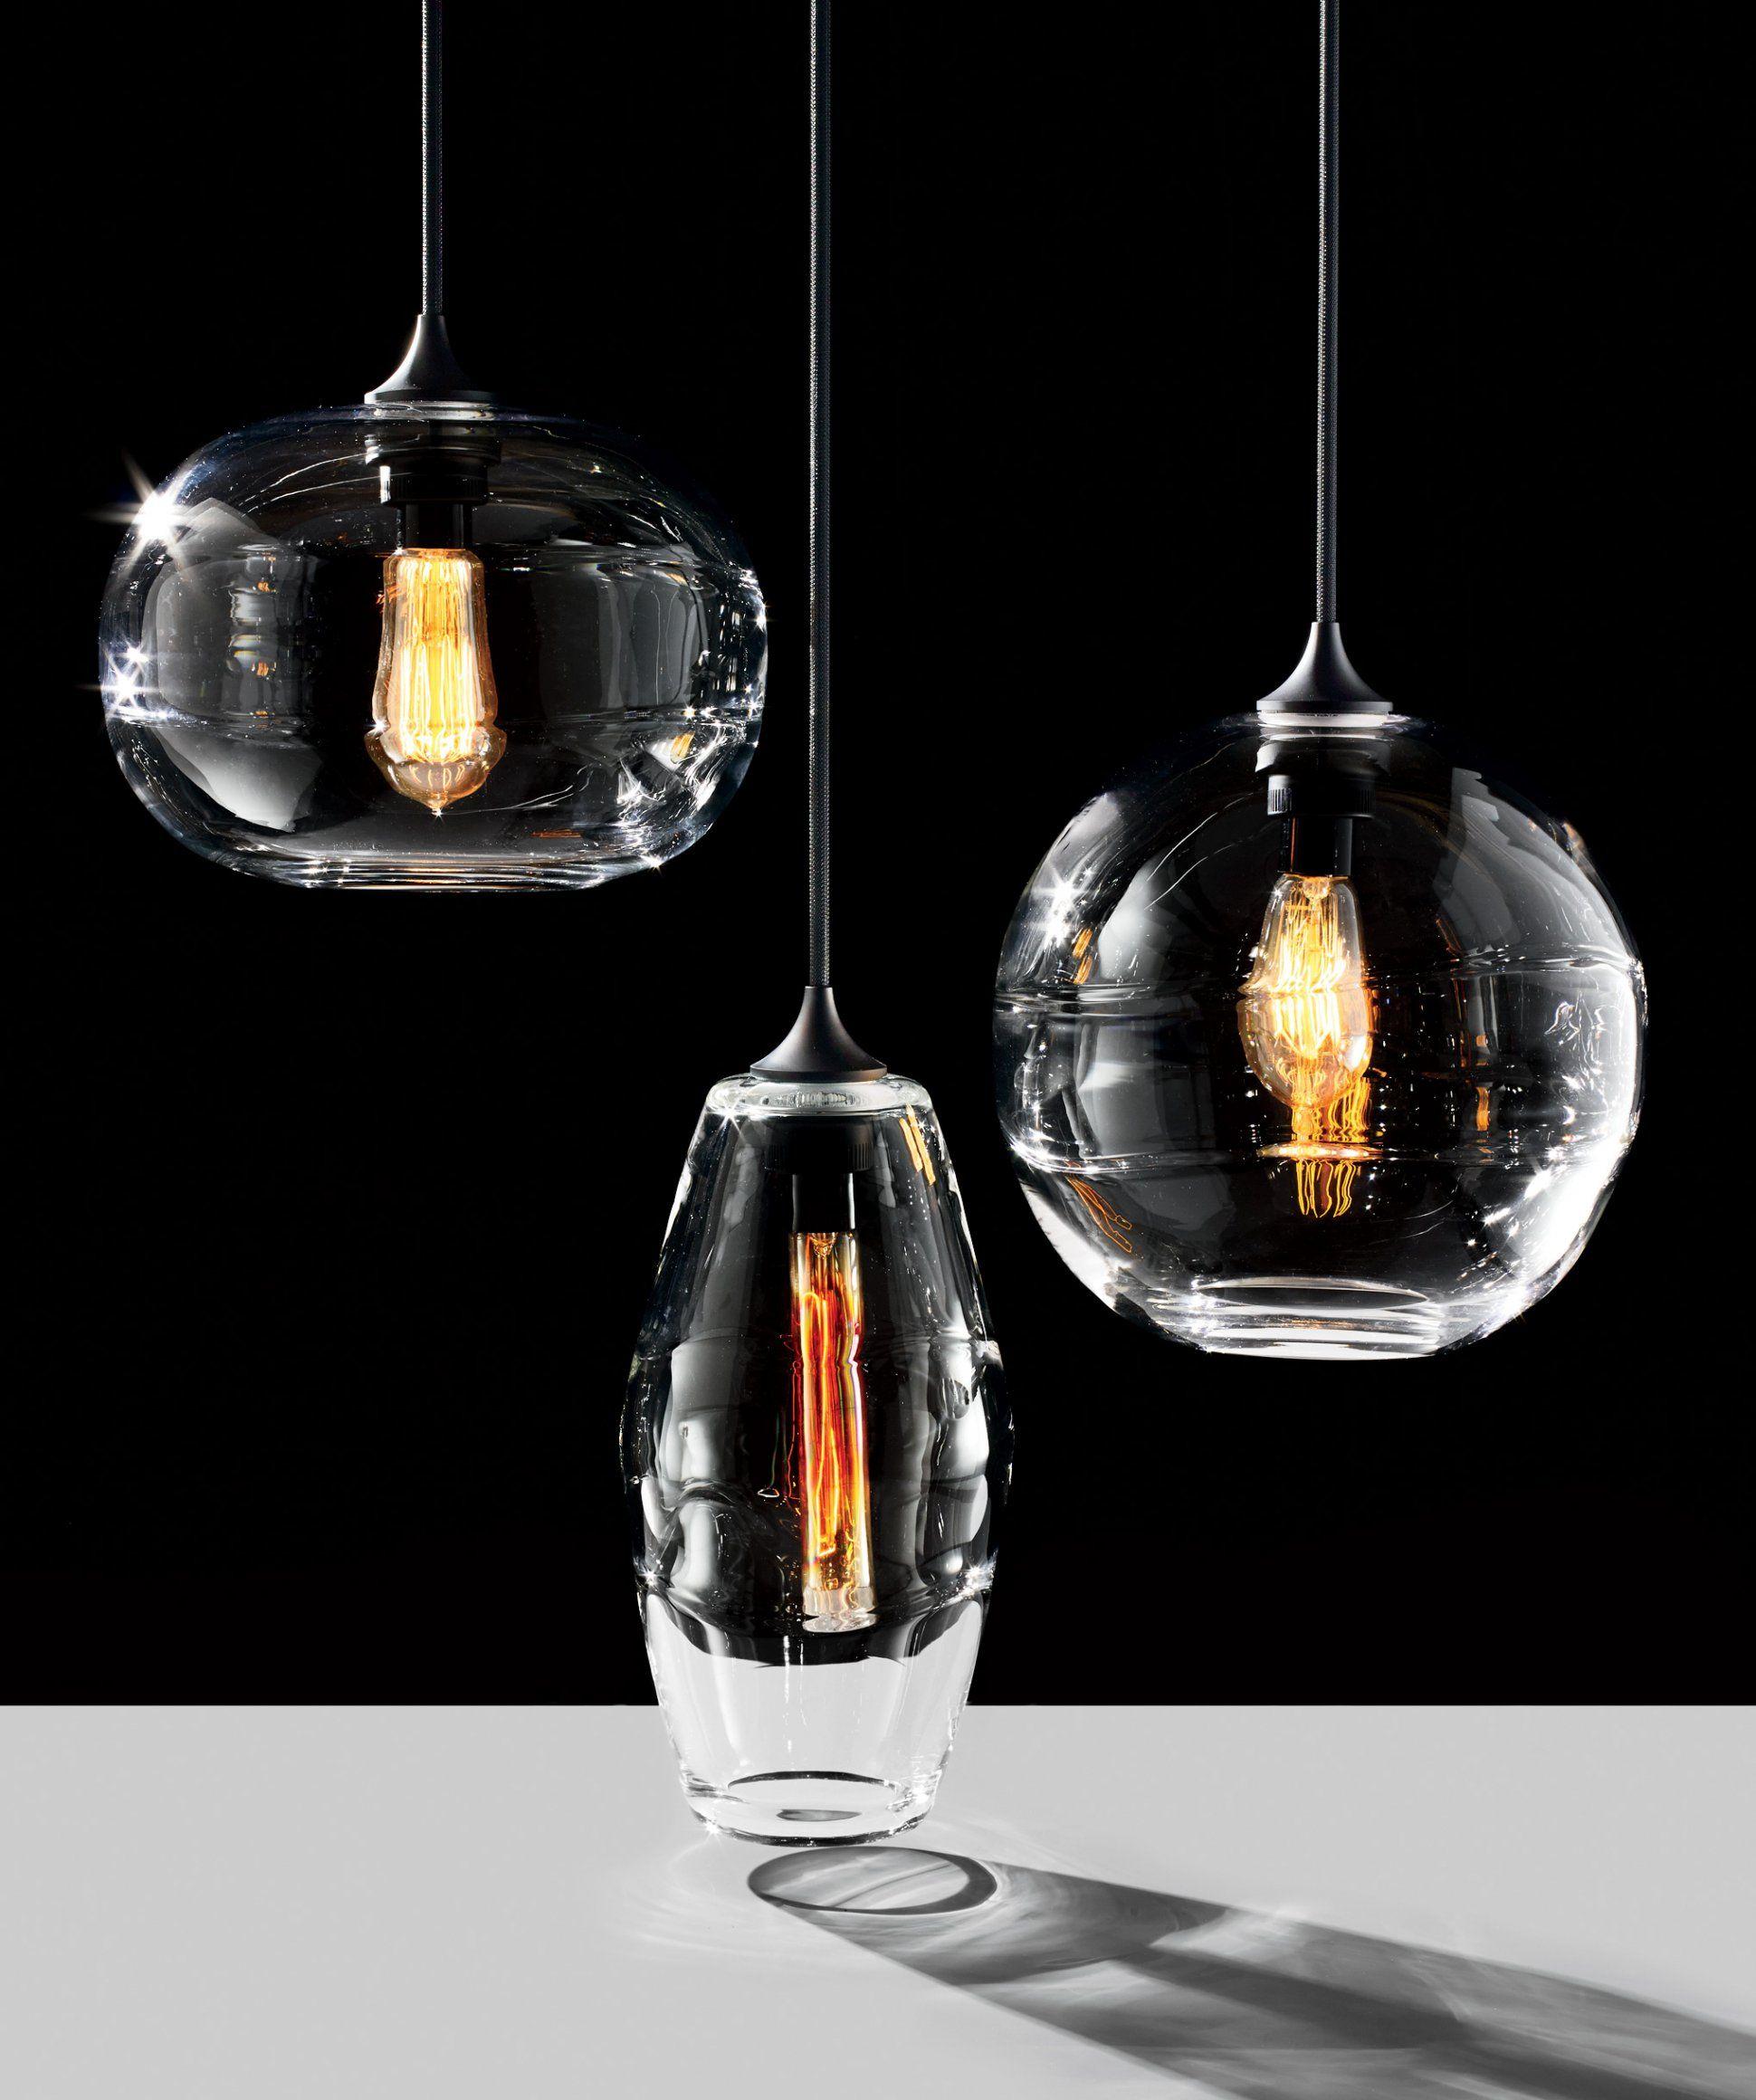 Light Fixtures By John Pomp Studios